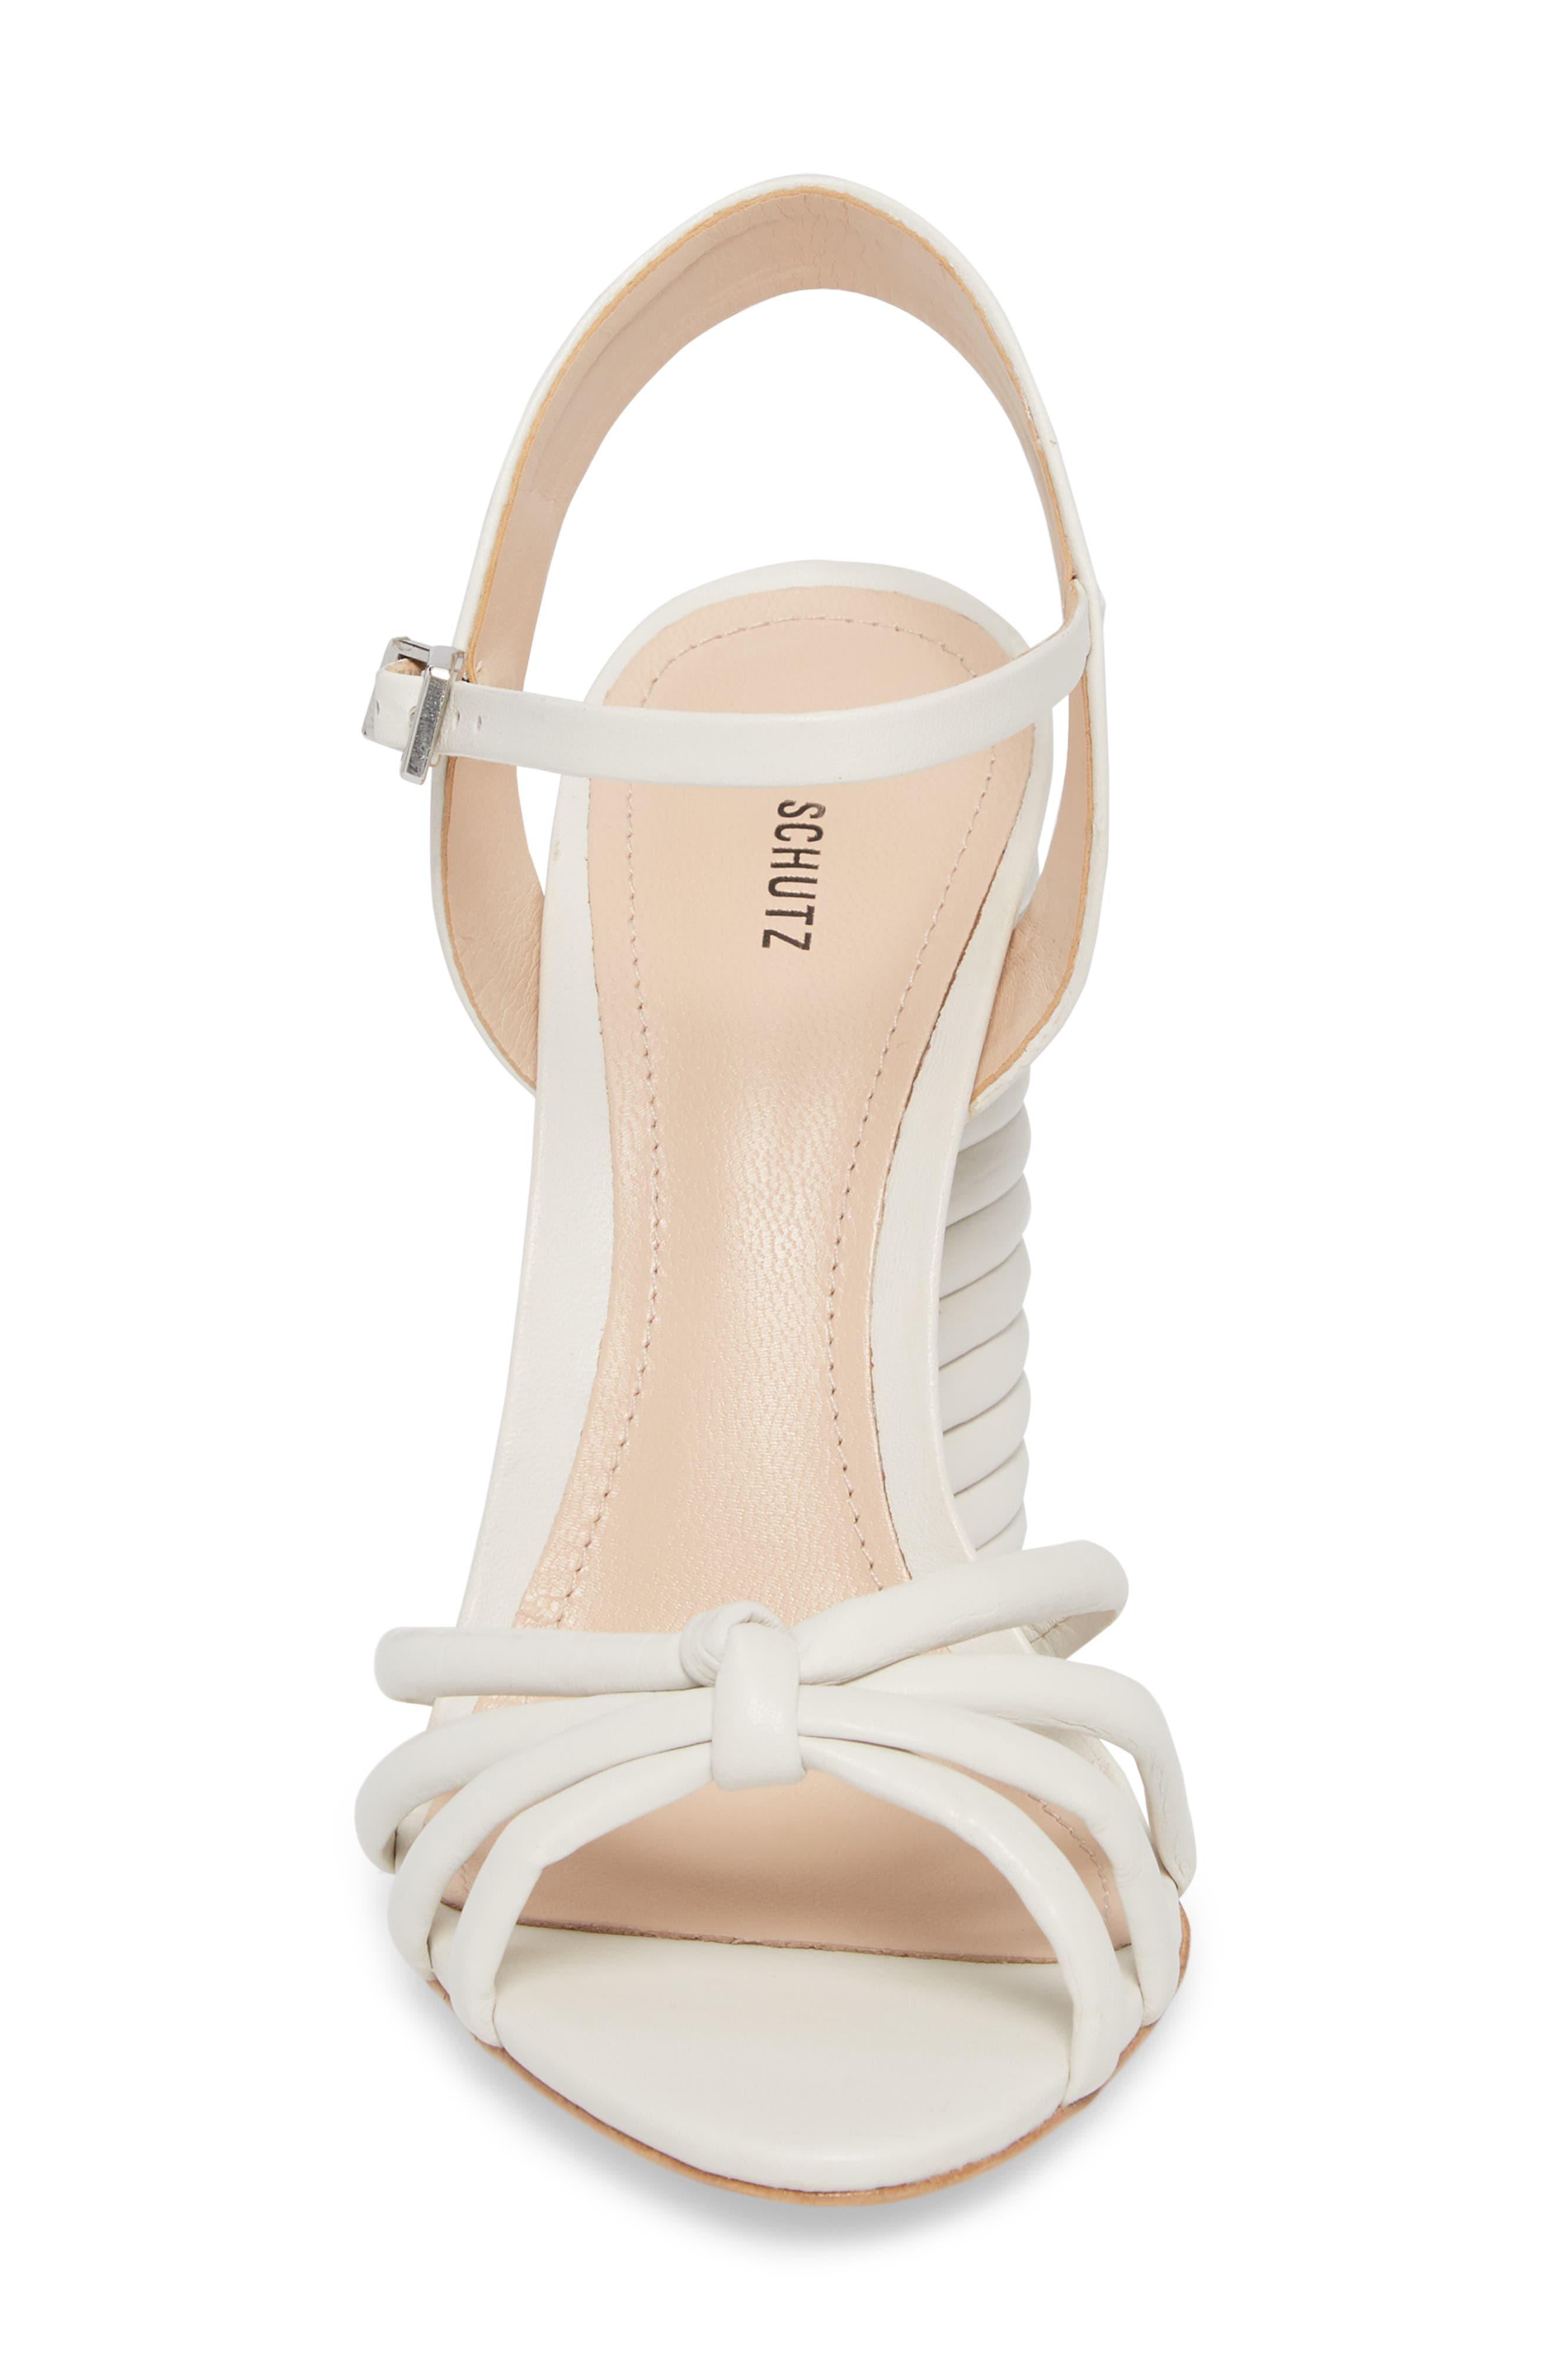 Paolla Column Heel Sandal,                             Alternate thumbnail 4, color,                             100